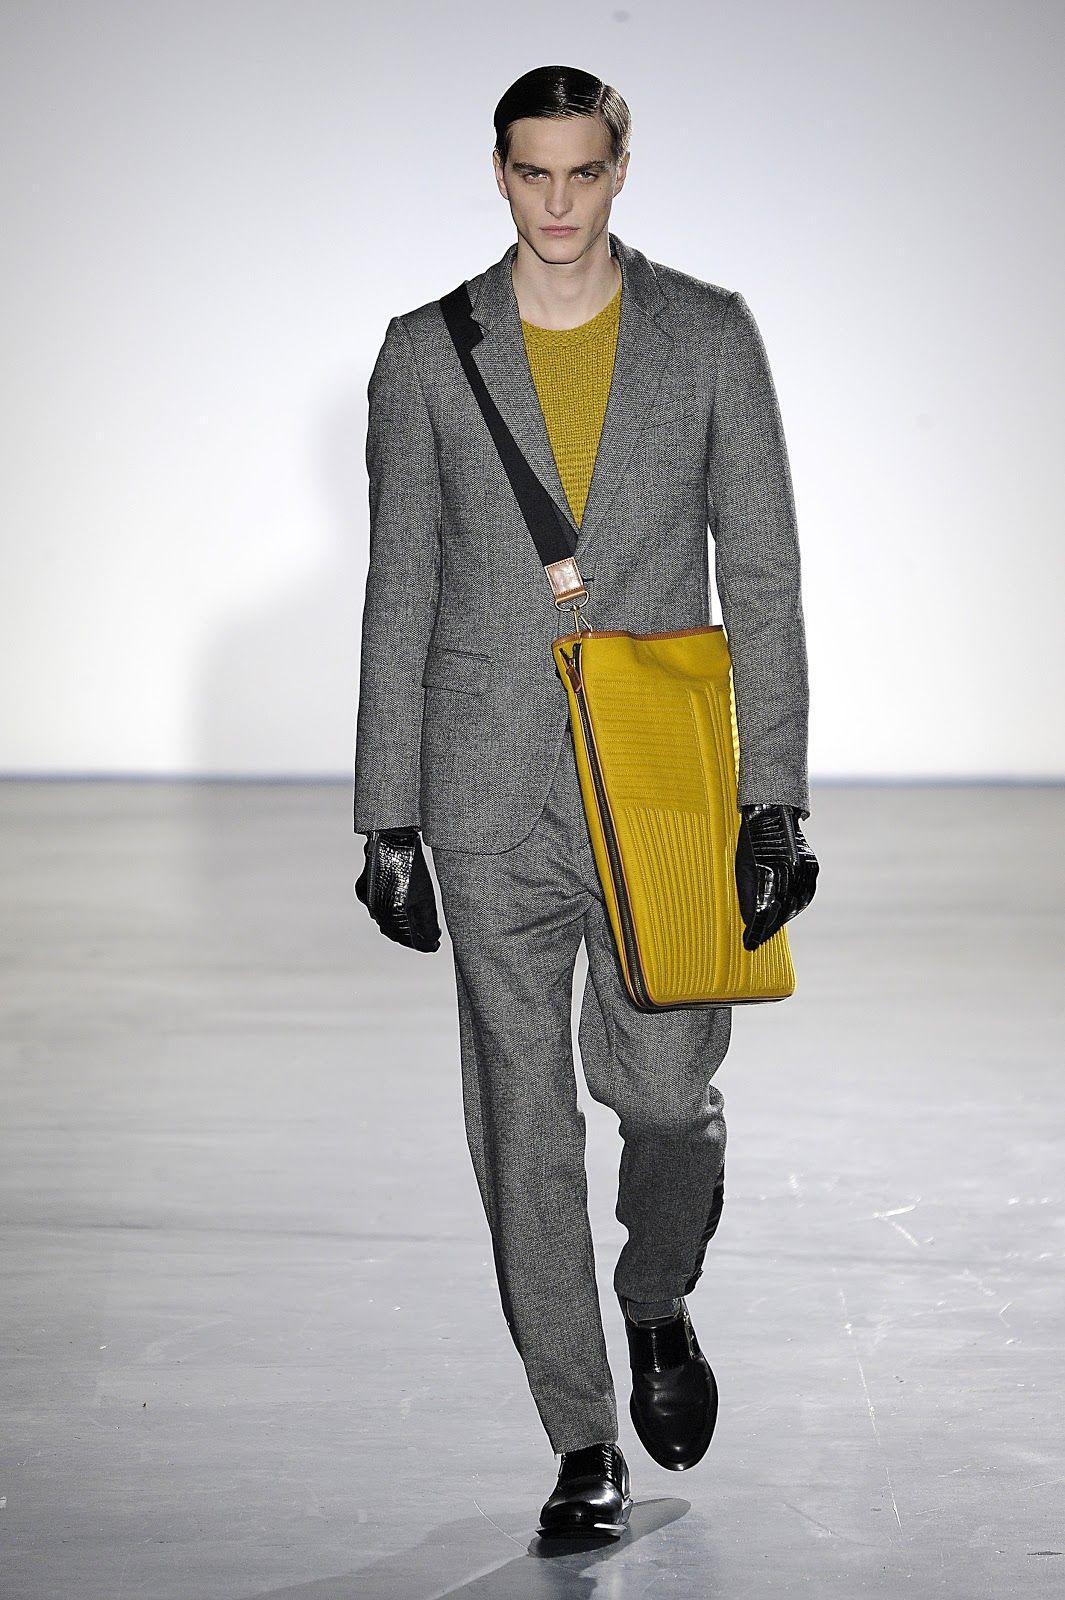 Standard Deviation - Fashion. Design. Culture. Art. Myko.: Wooyoungmi Fall / Winter 2013 Menswear Runway + Video